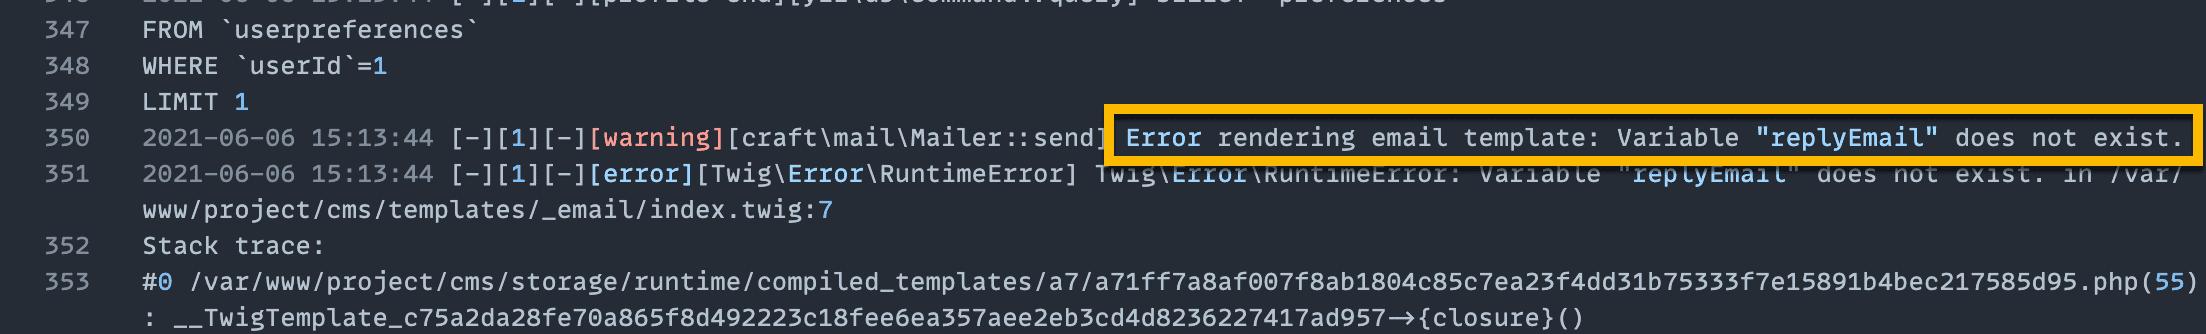 Email Rendering Error in Craft logs